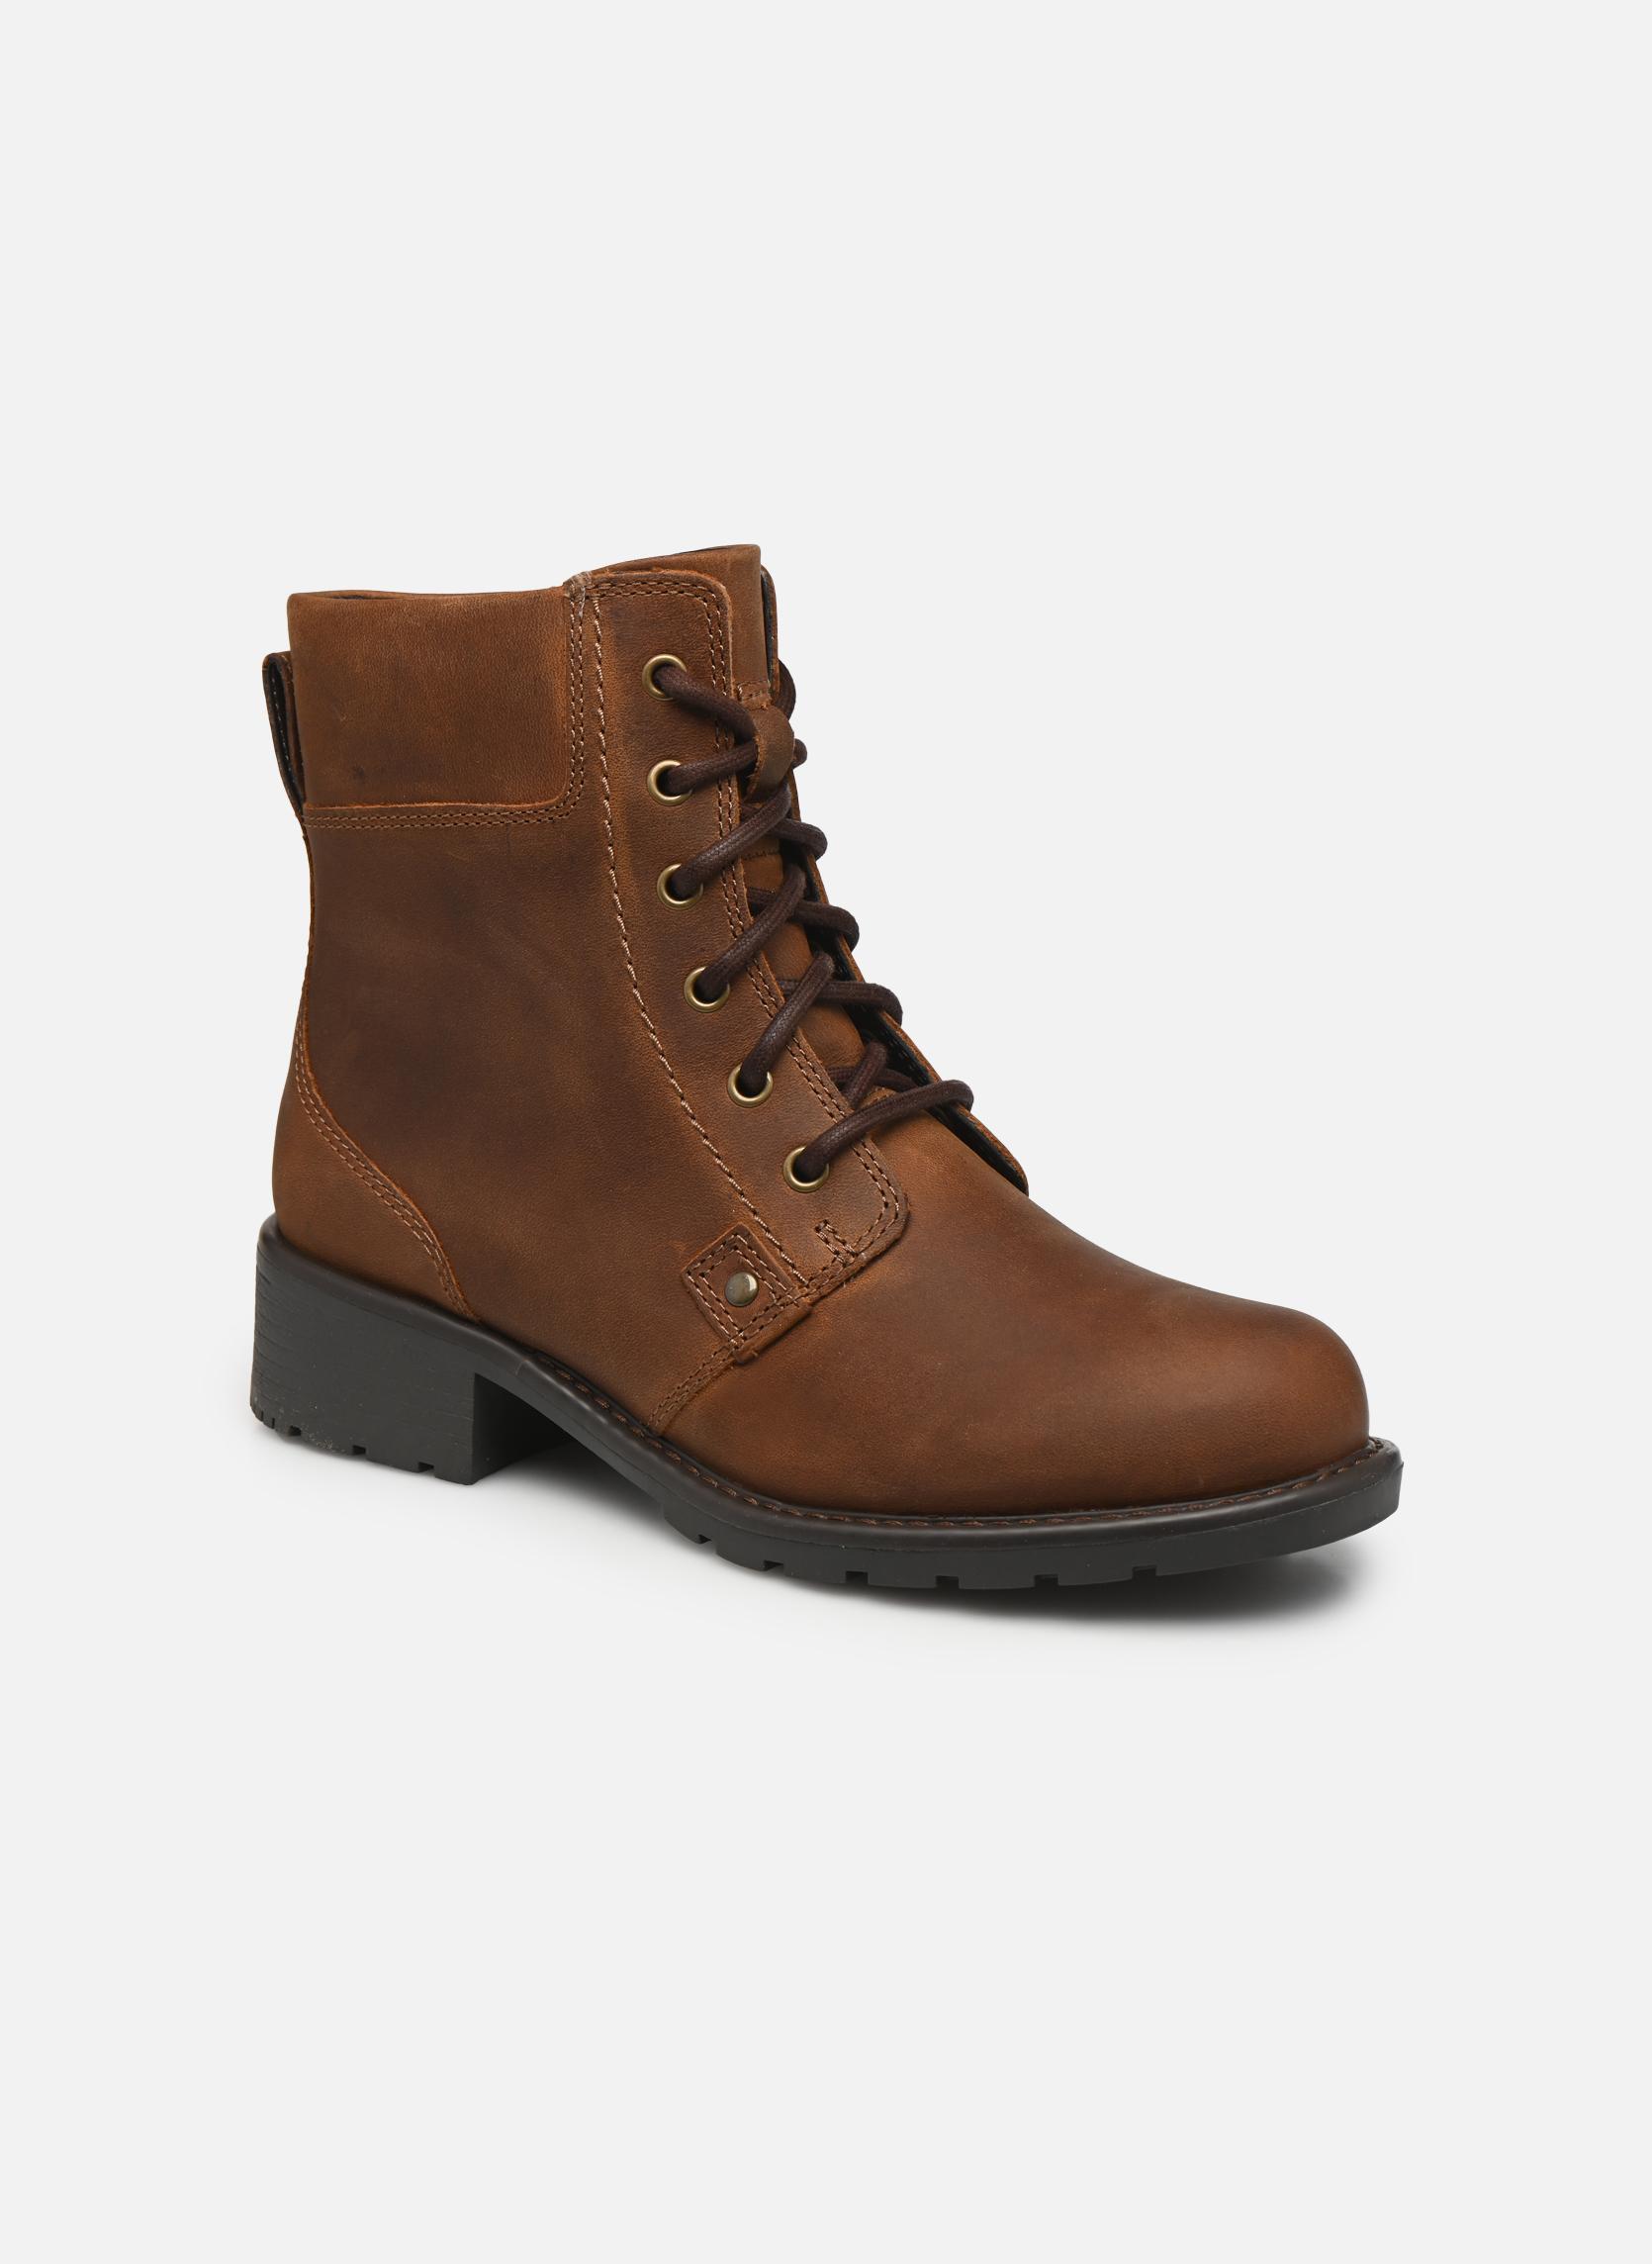 Stiefeletten & Boots Damen Orinoco Spice